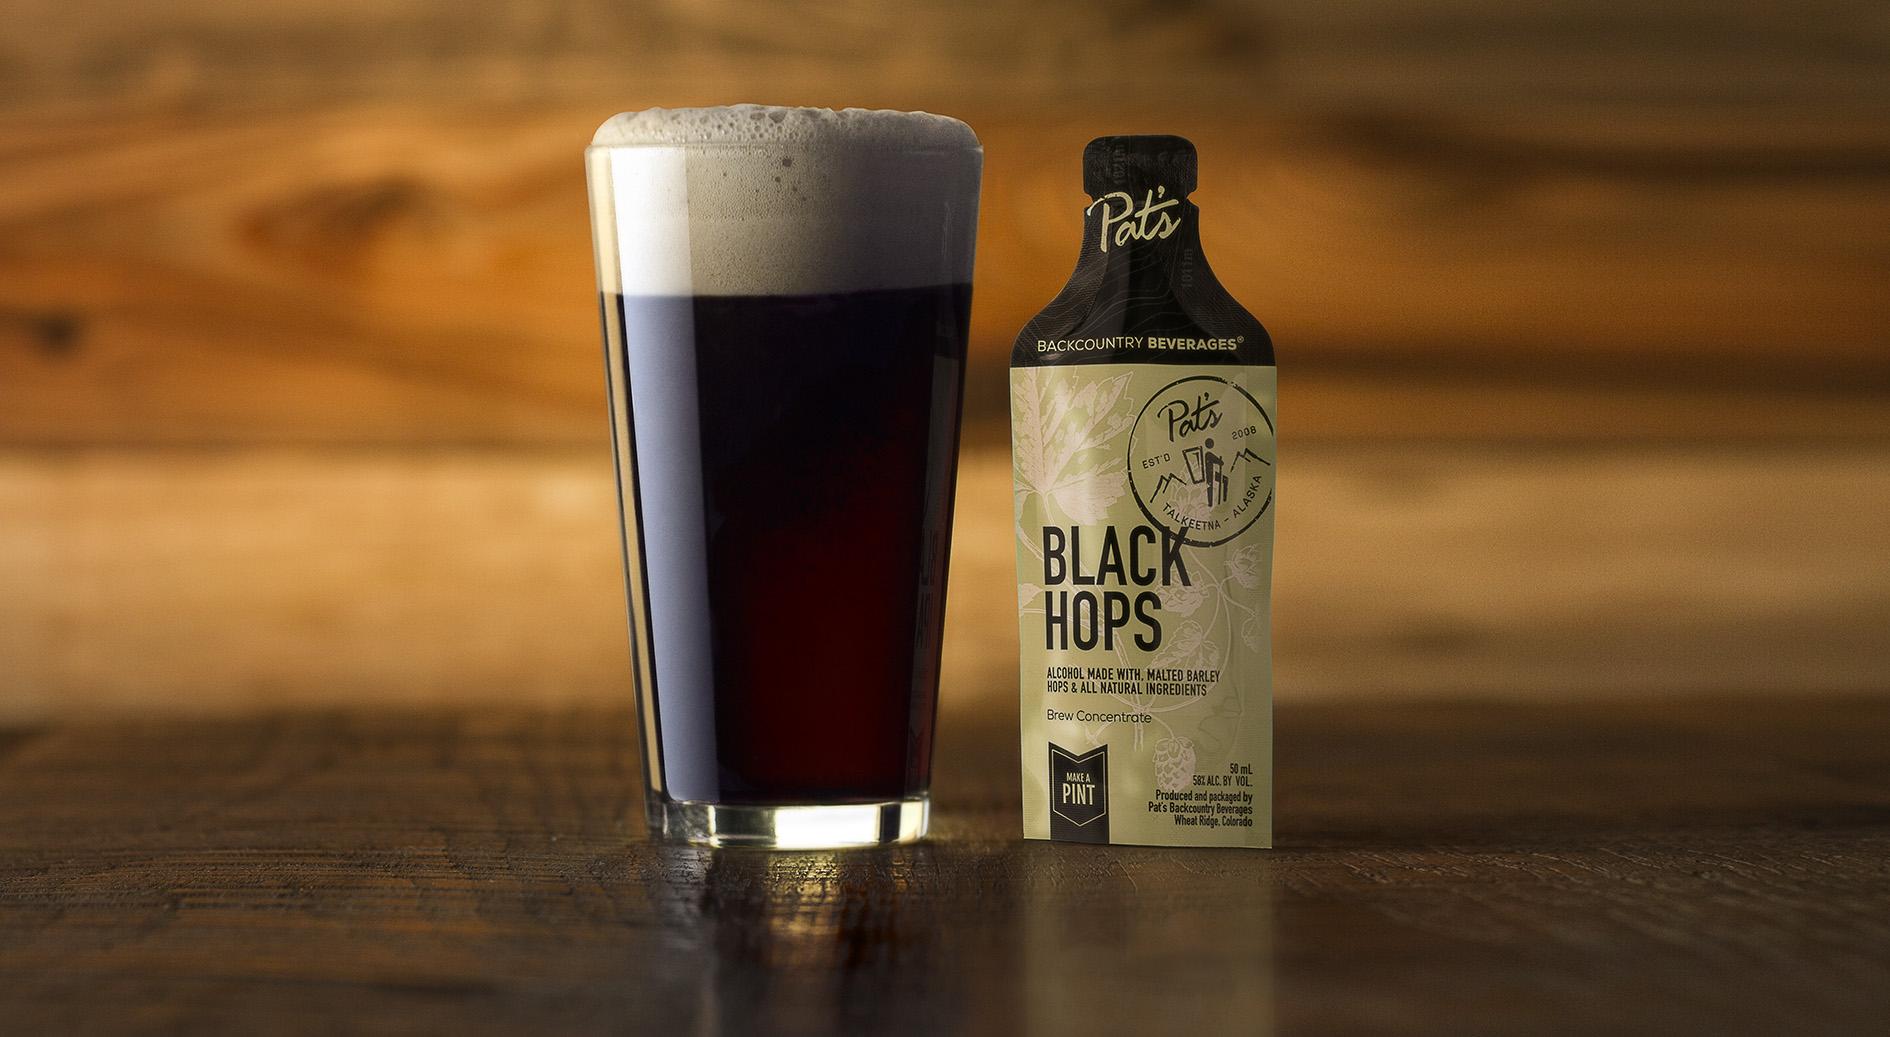 Black-Hops-Pint